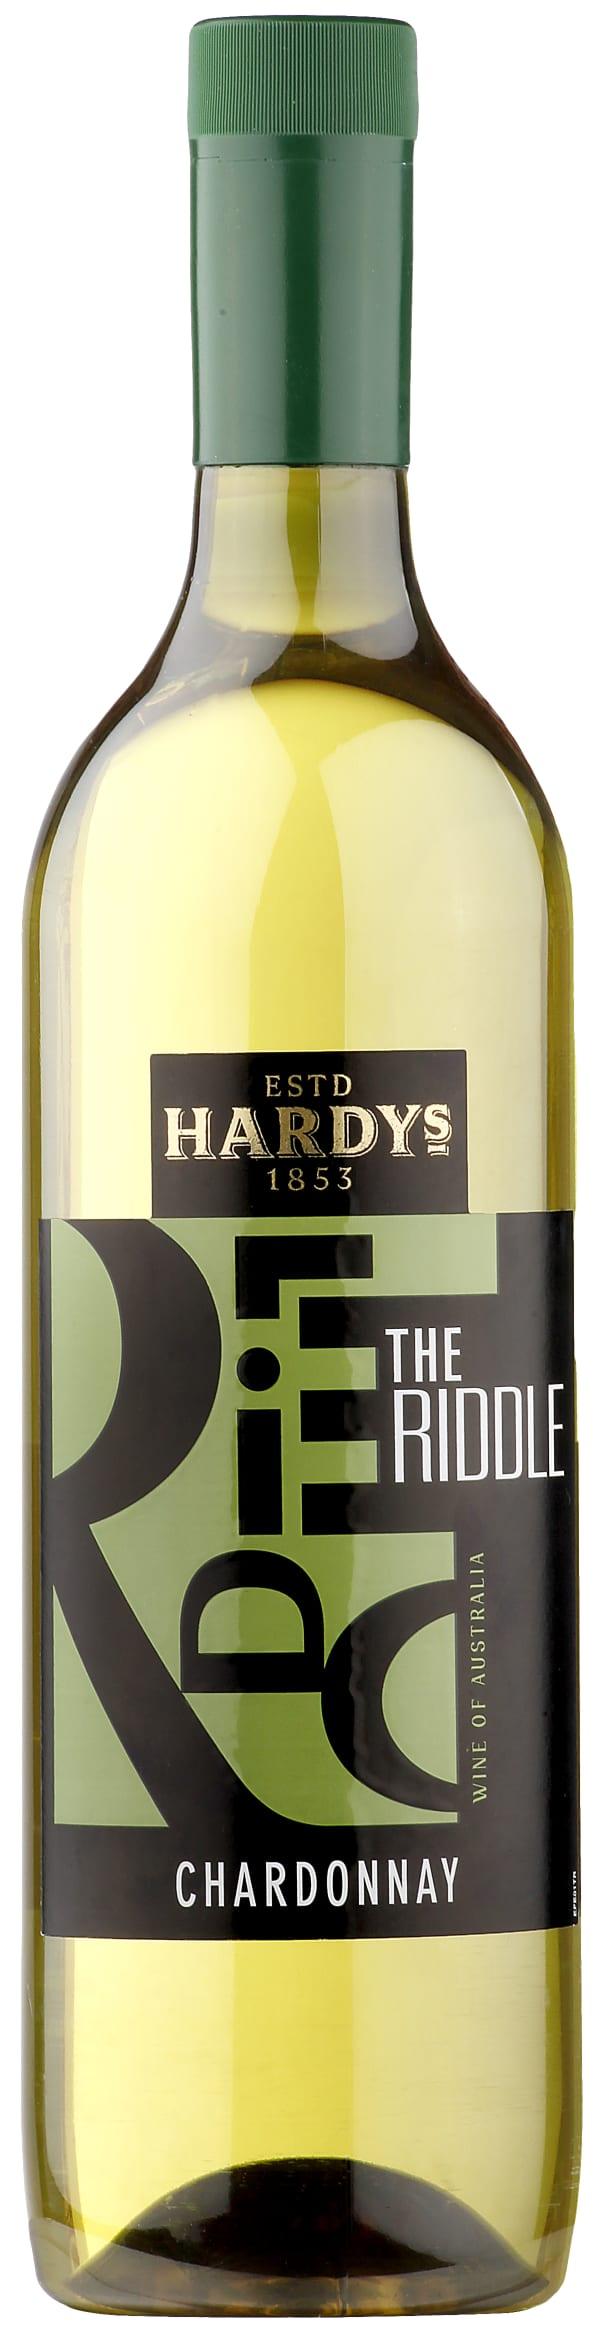 Hardys The Riddle Chardonnay 2016 muovipullo